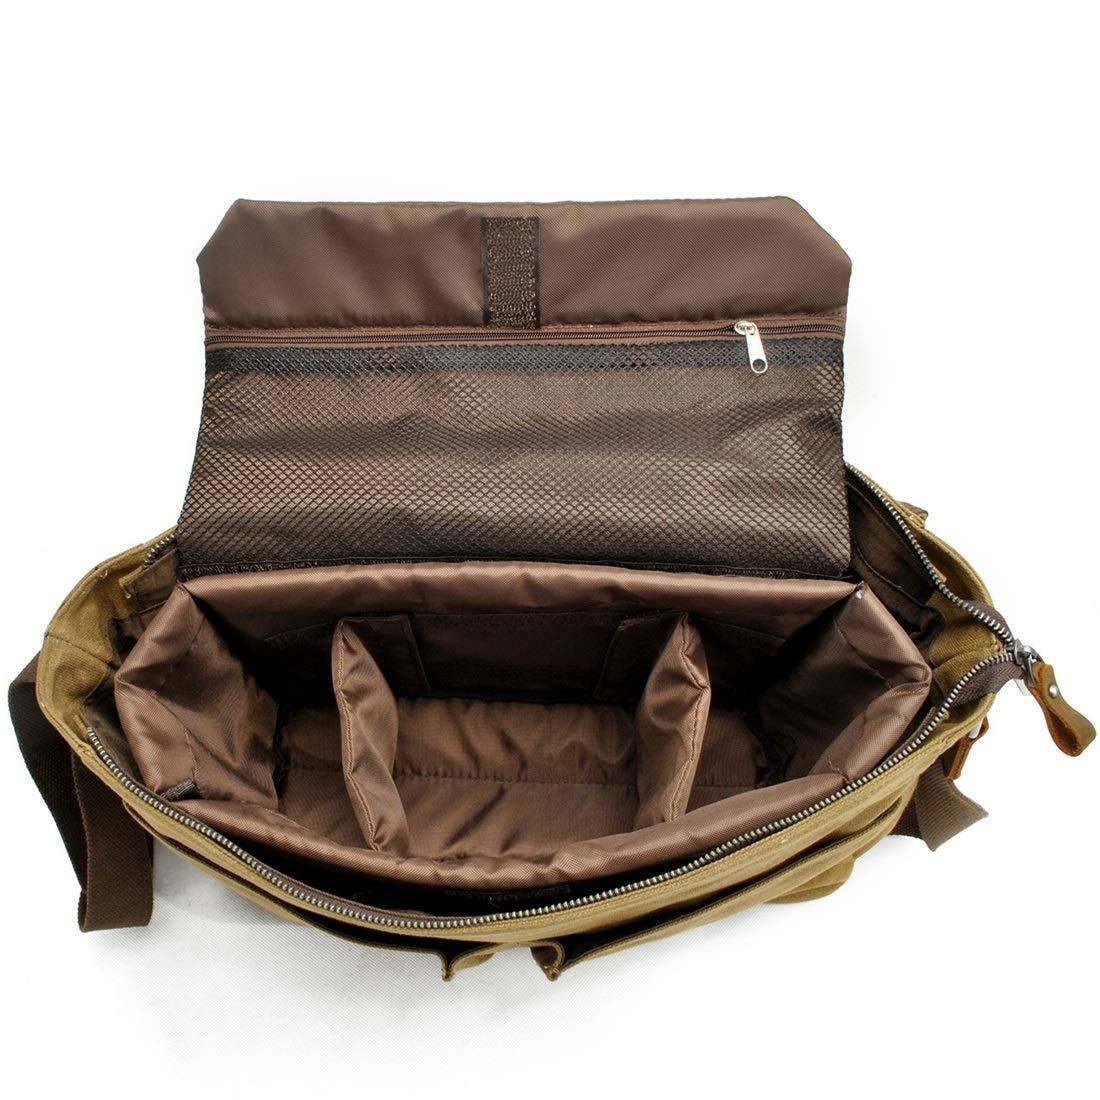 RABILTY Simple Retro Zipper Waterproof Canvas Camera Bag Briefcase Shoulder Bag Messenger Bag Color : Khaki